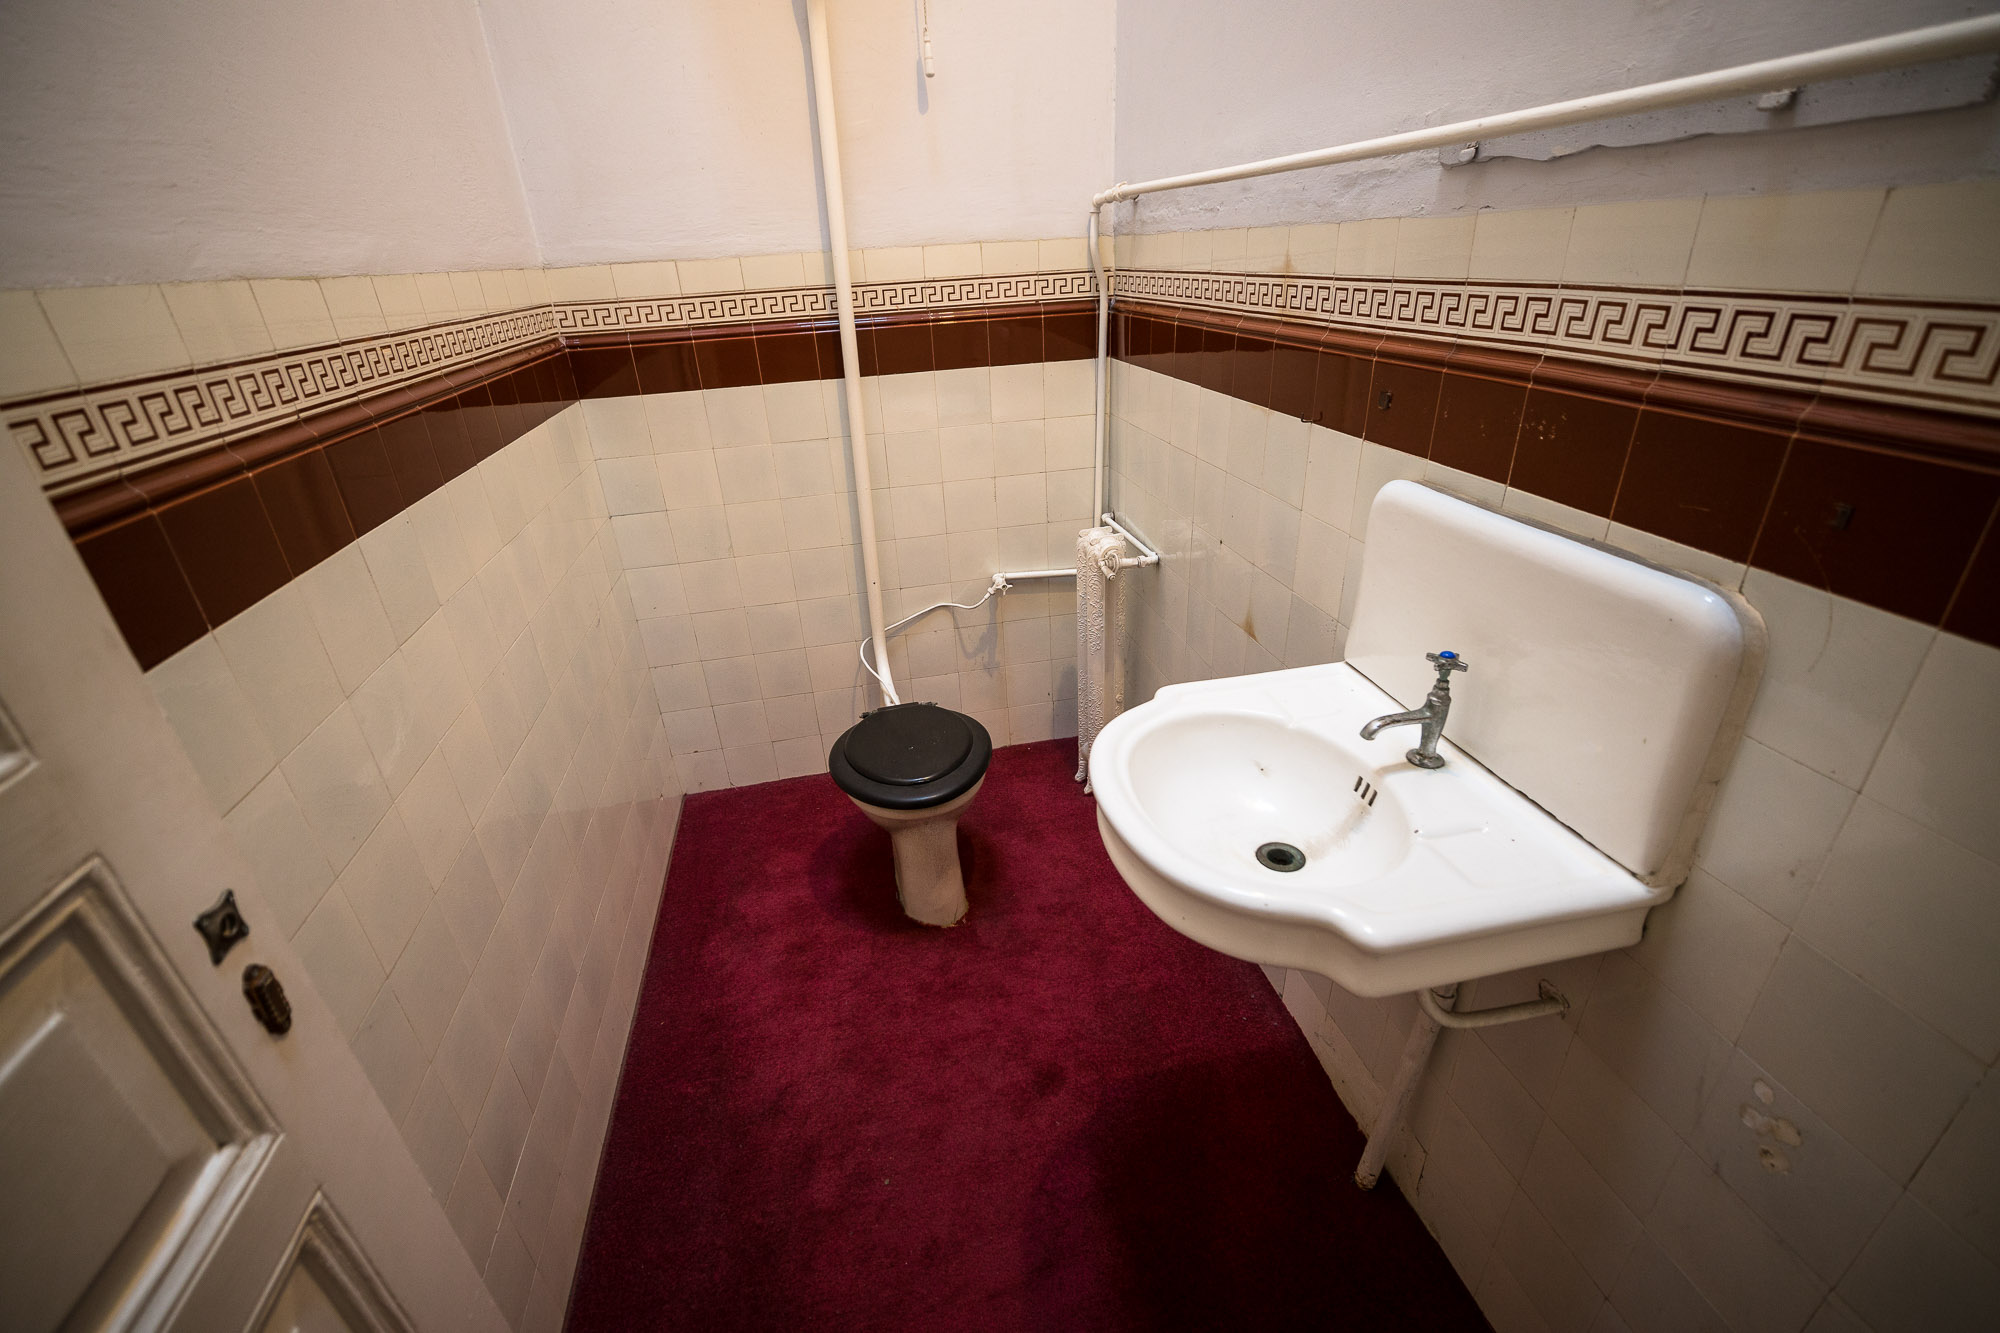 Atatürk's toilet